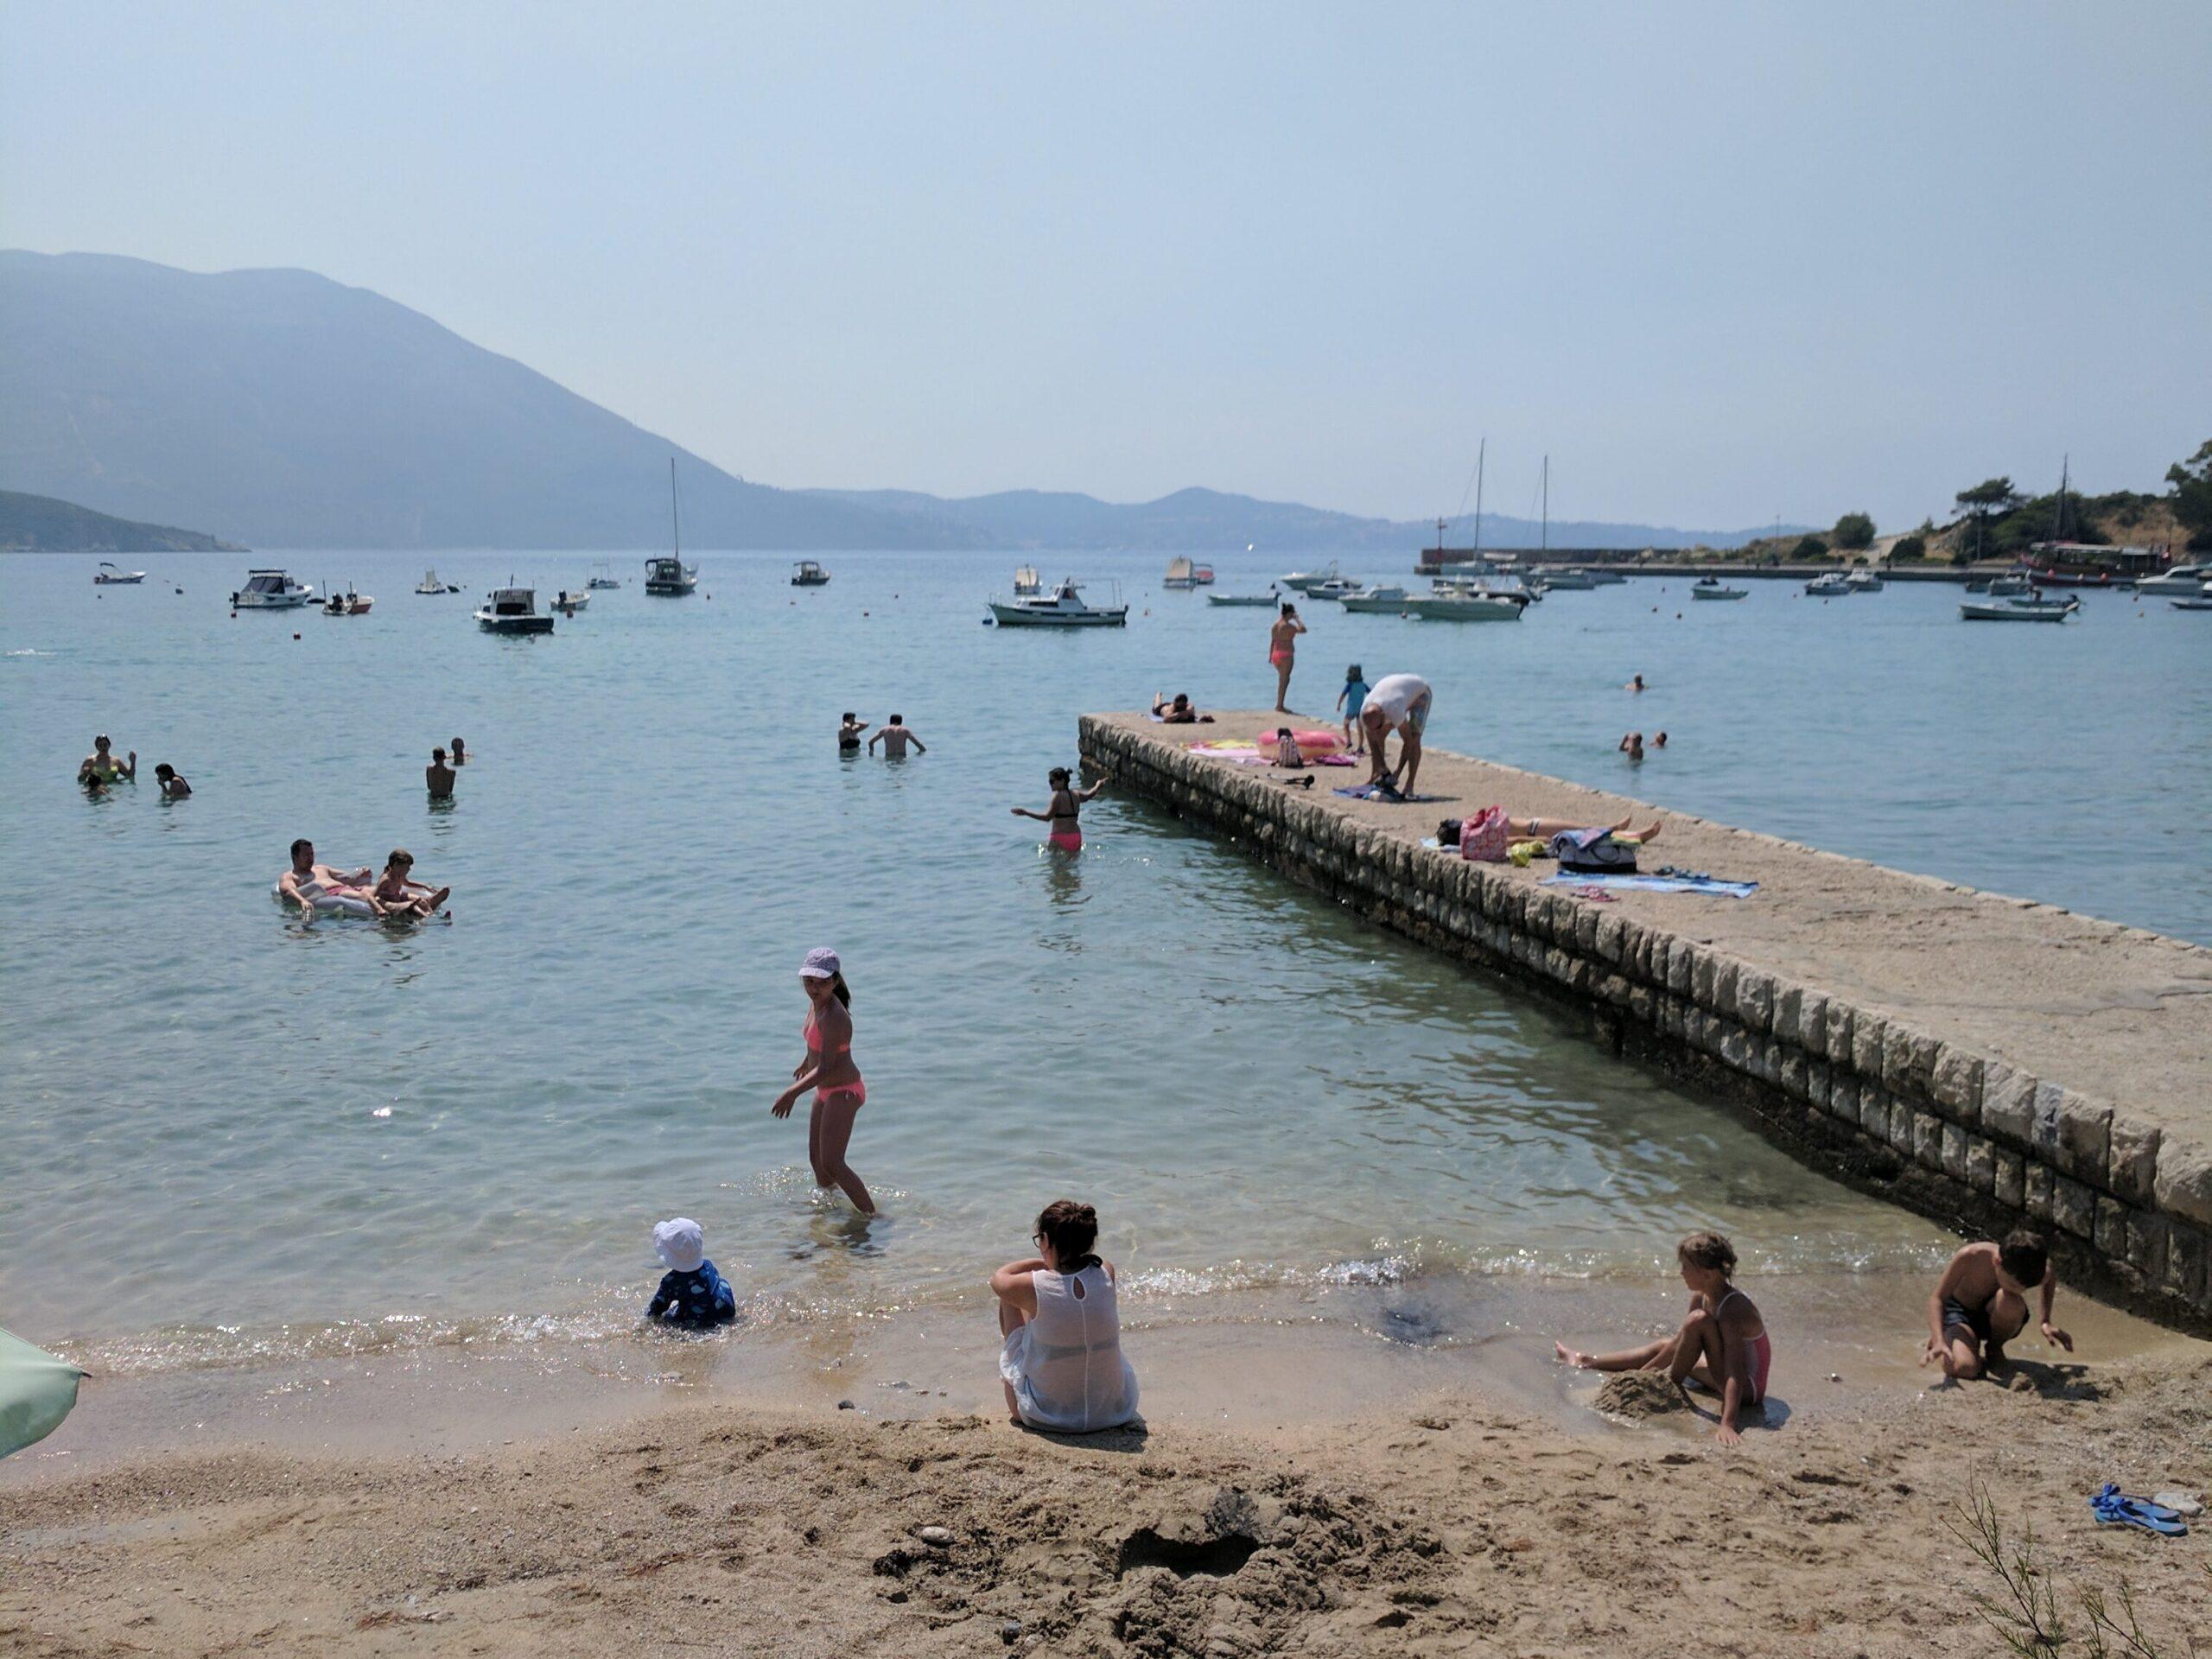 Beachgoers in croatia.